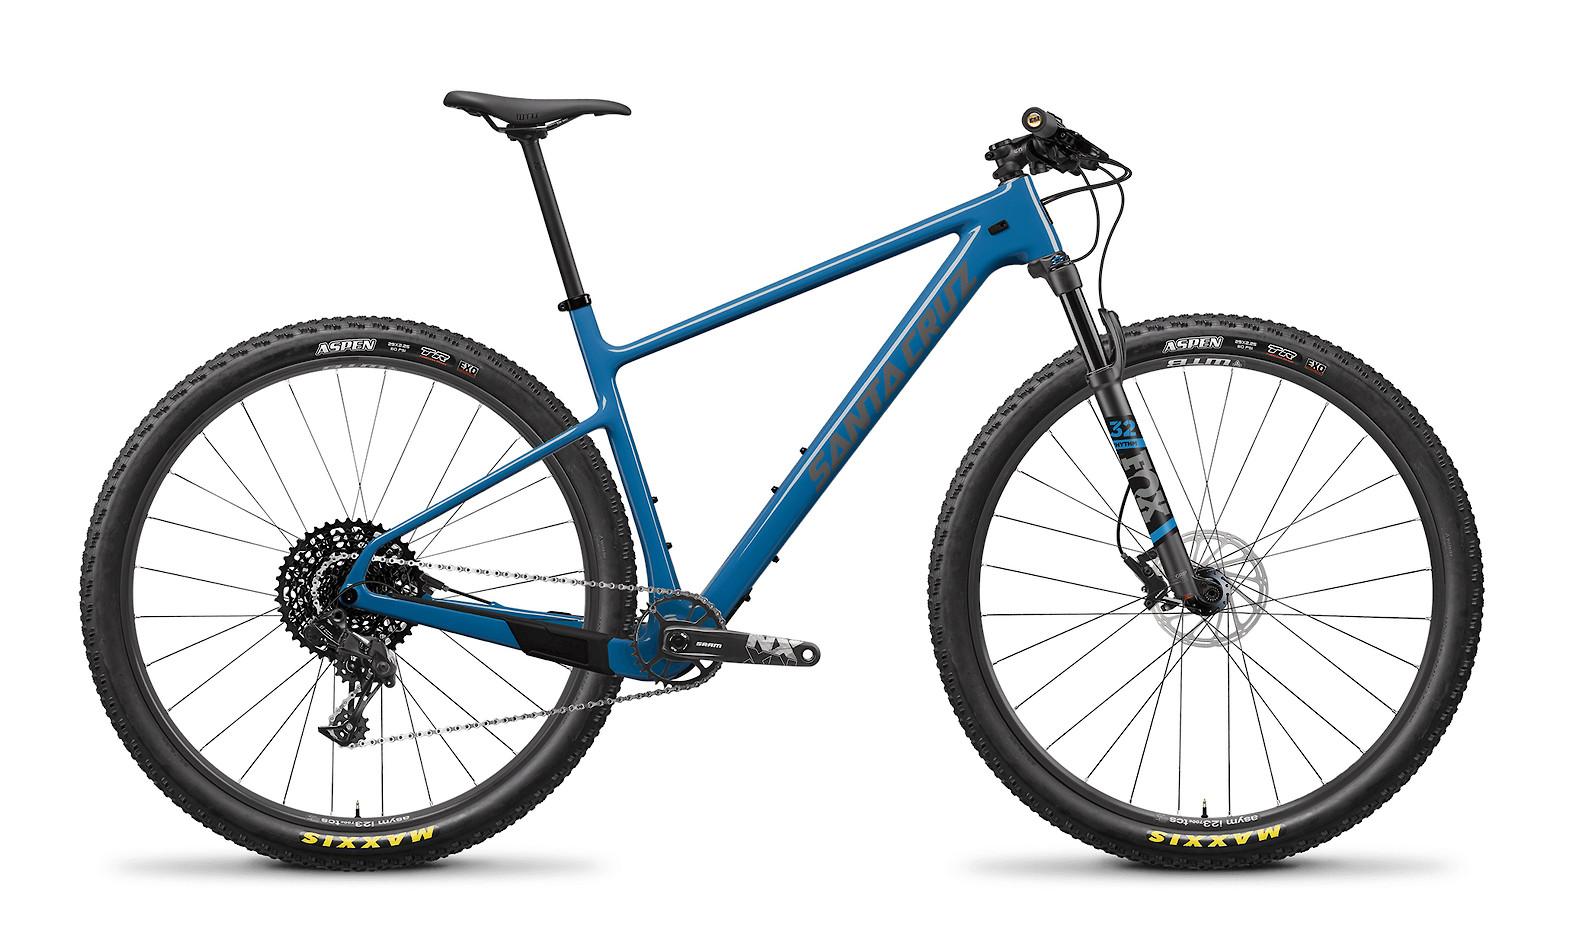 2020 Santa Cruz Highball Carbon C R (WC Blue and Primer)